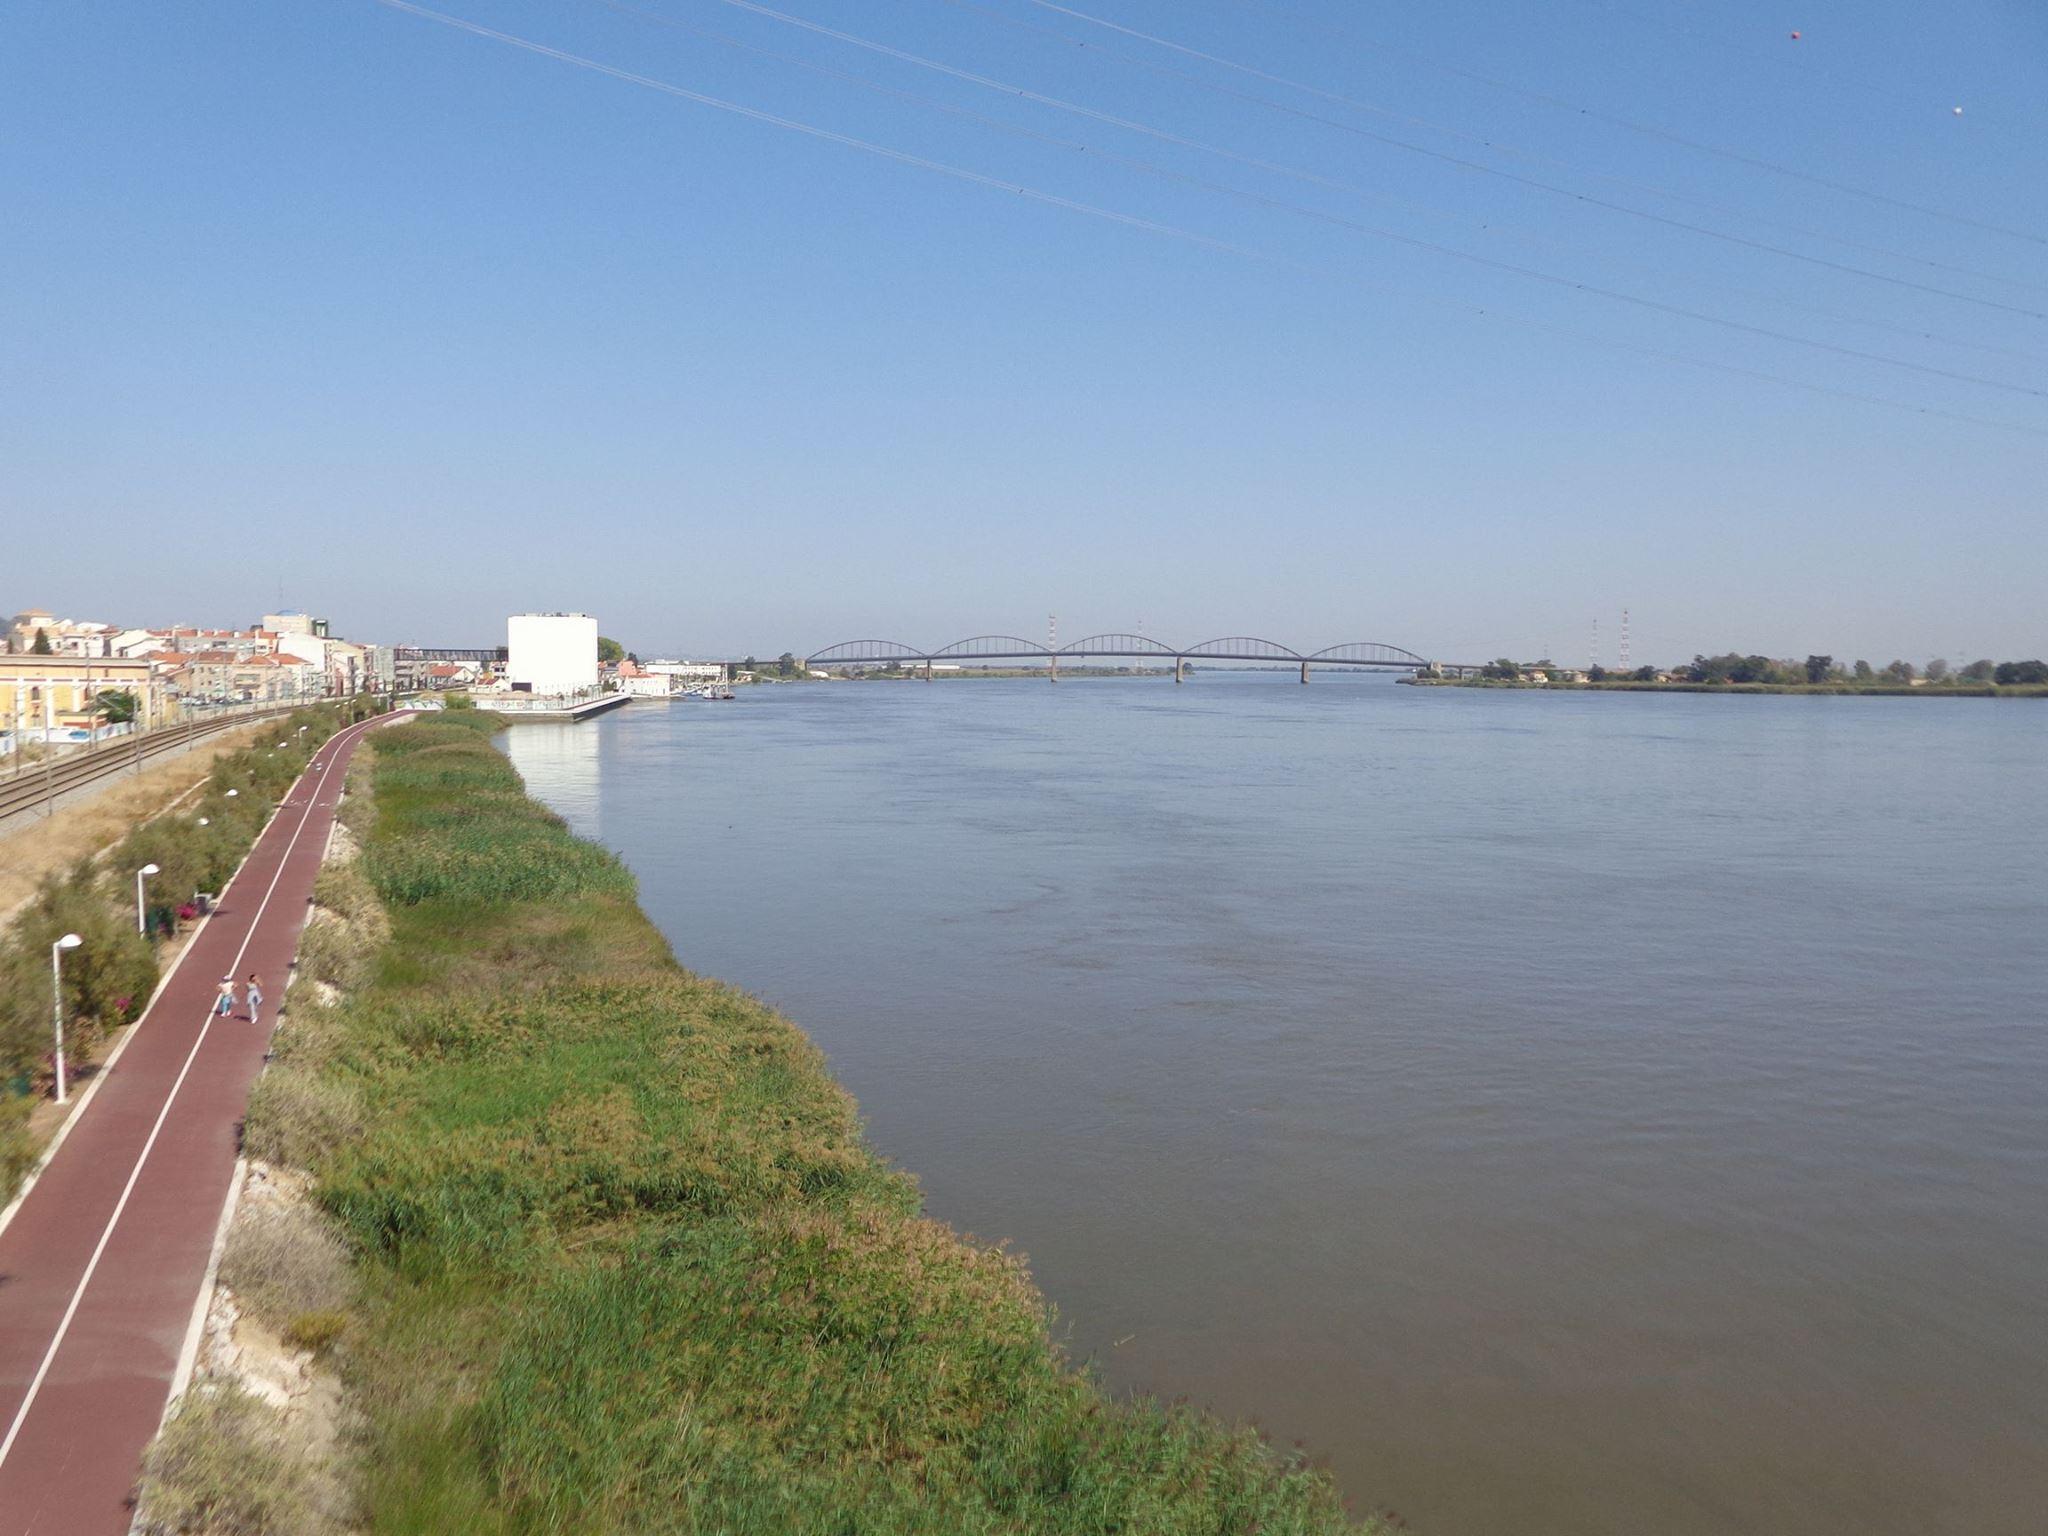 Passeio pela beira rio, visita aos Fortes e Qta de Subserra